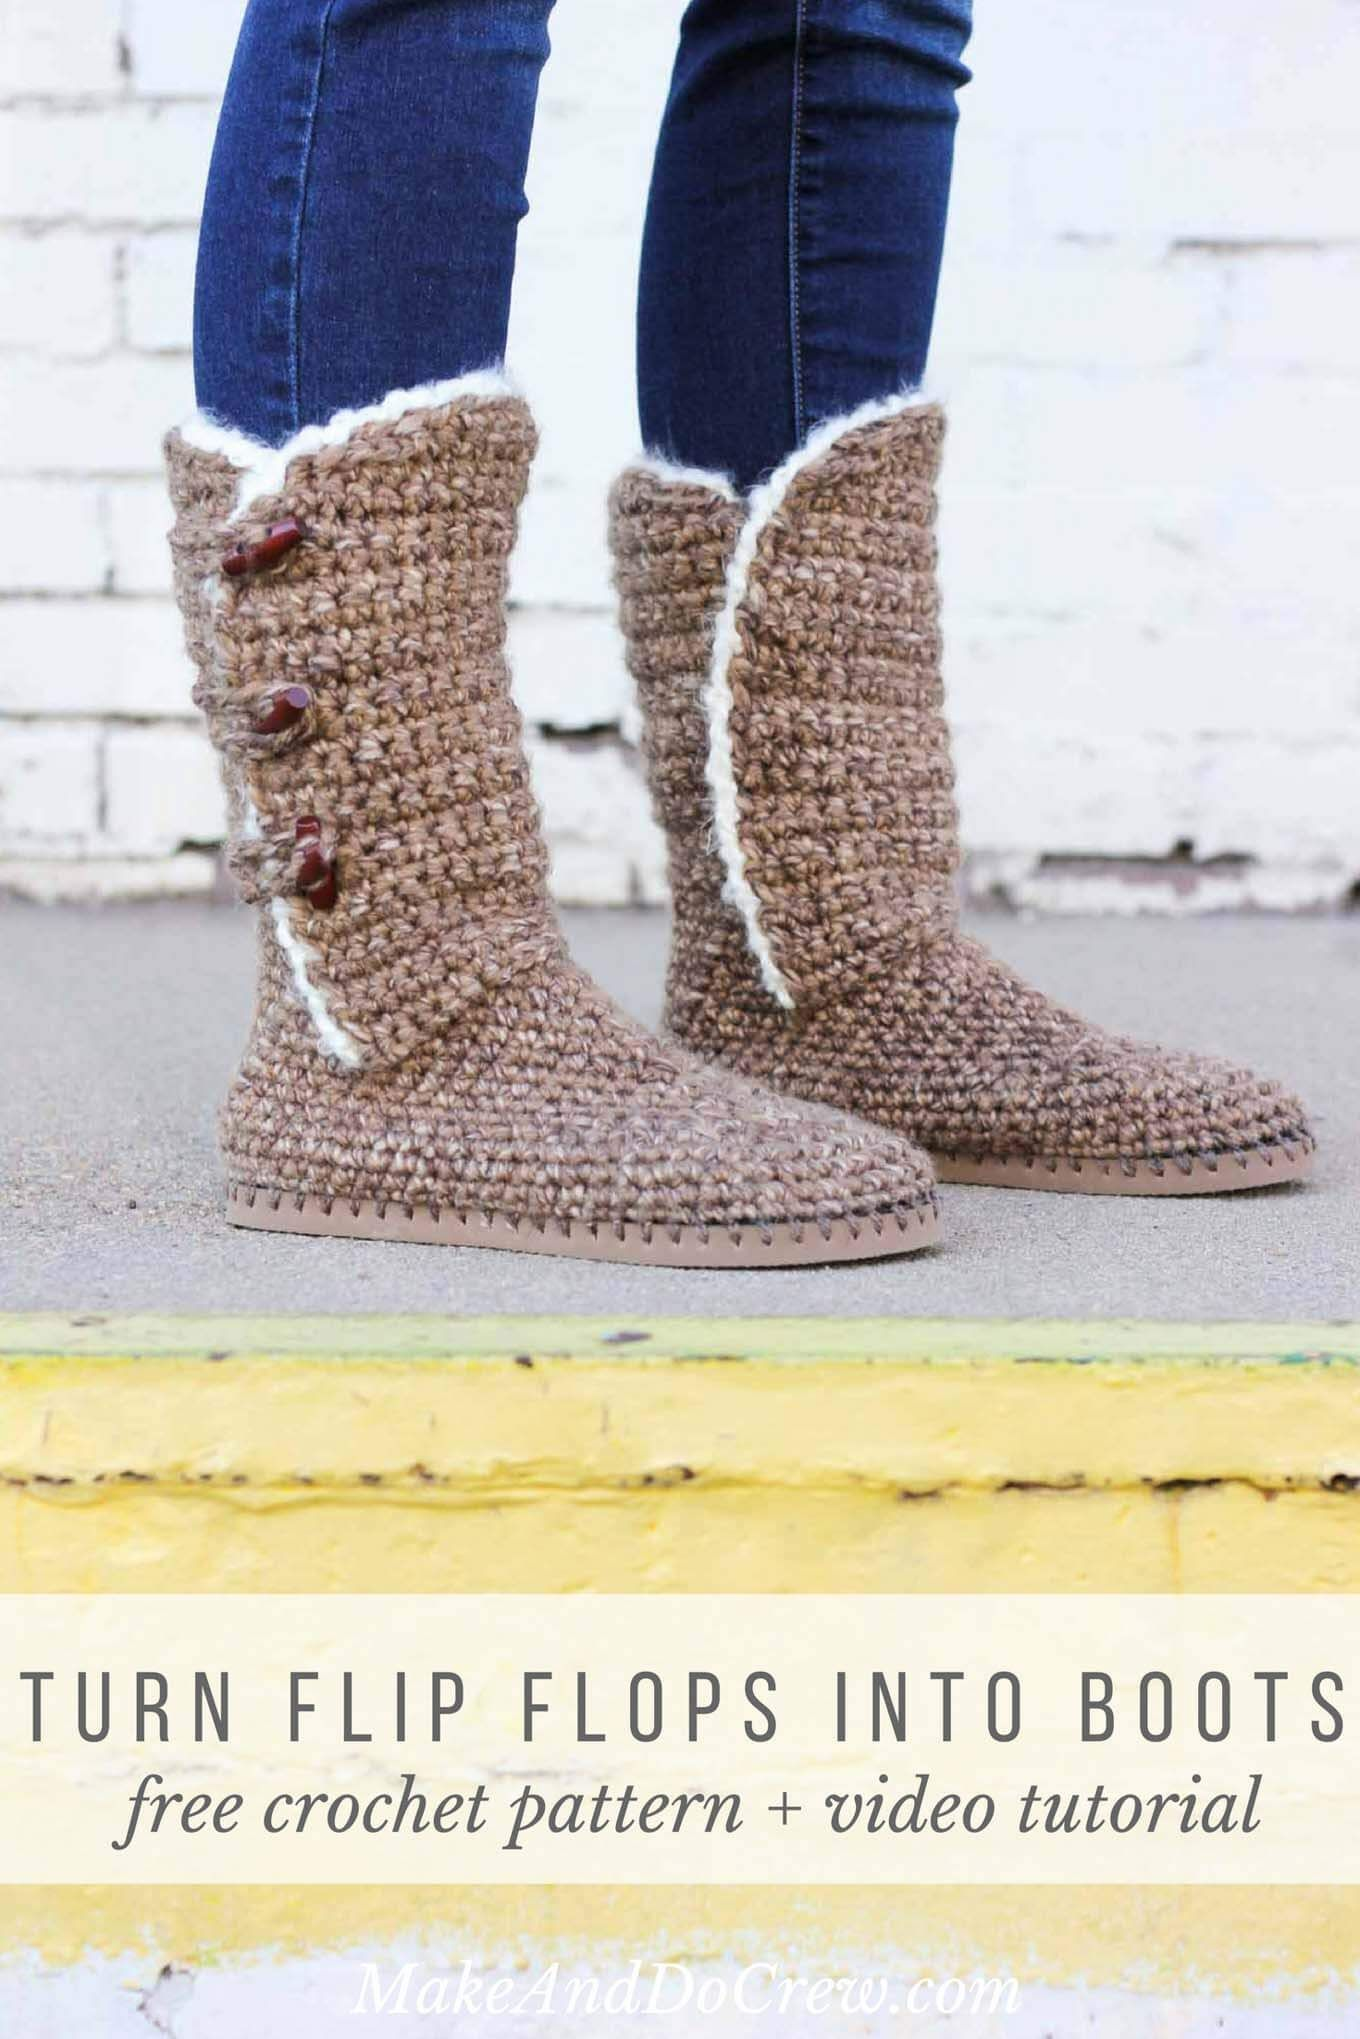 Ugg Style Free Crochet Boots Pattern Using Flip Flops Hometalk